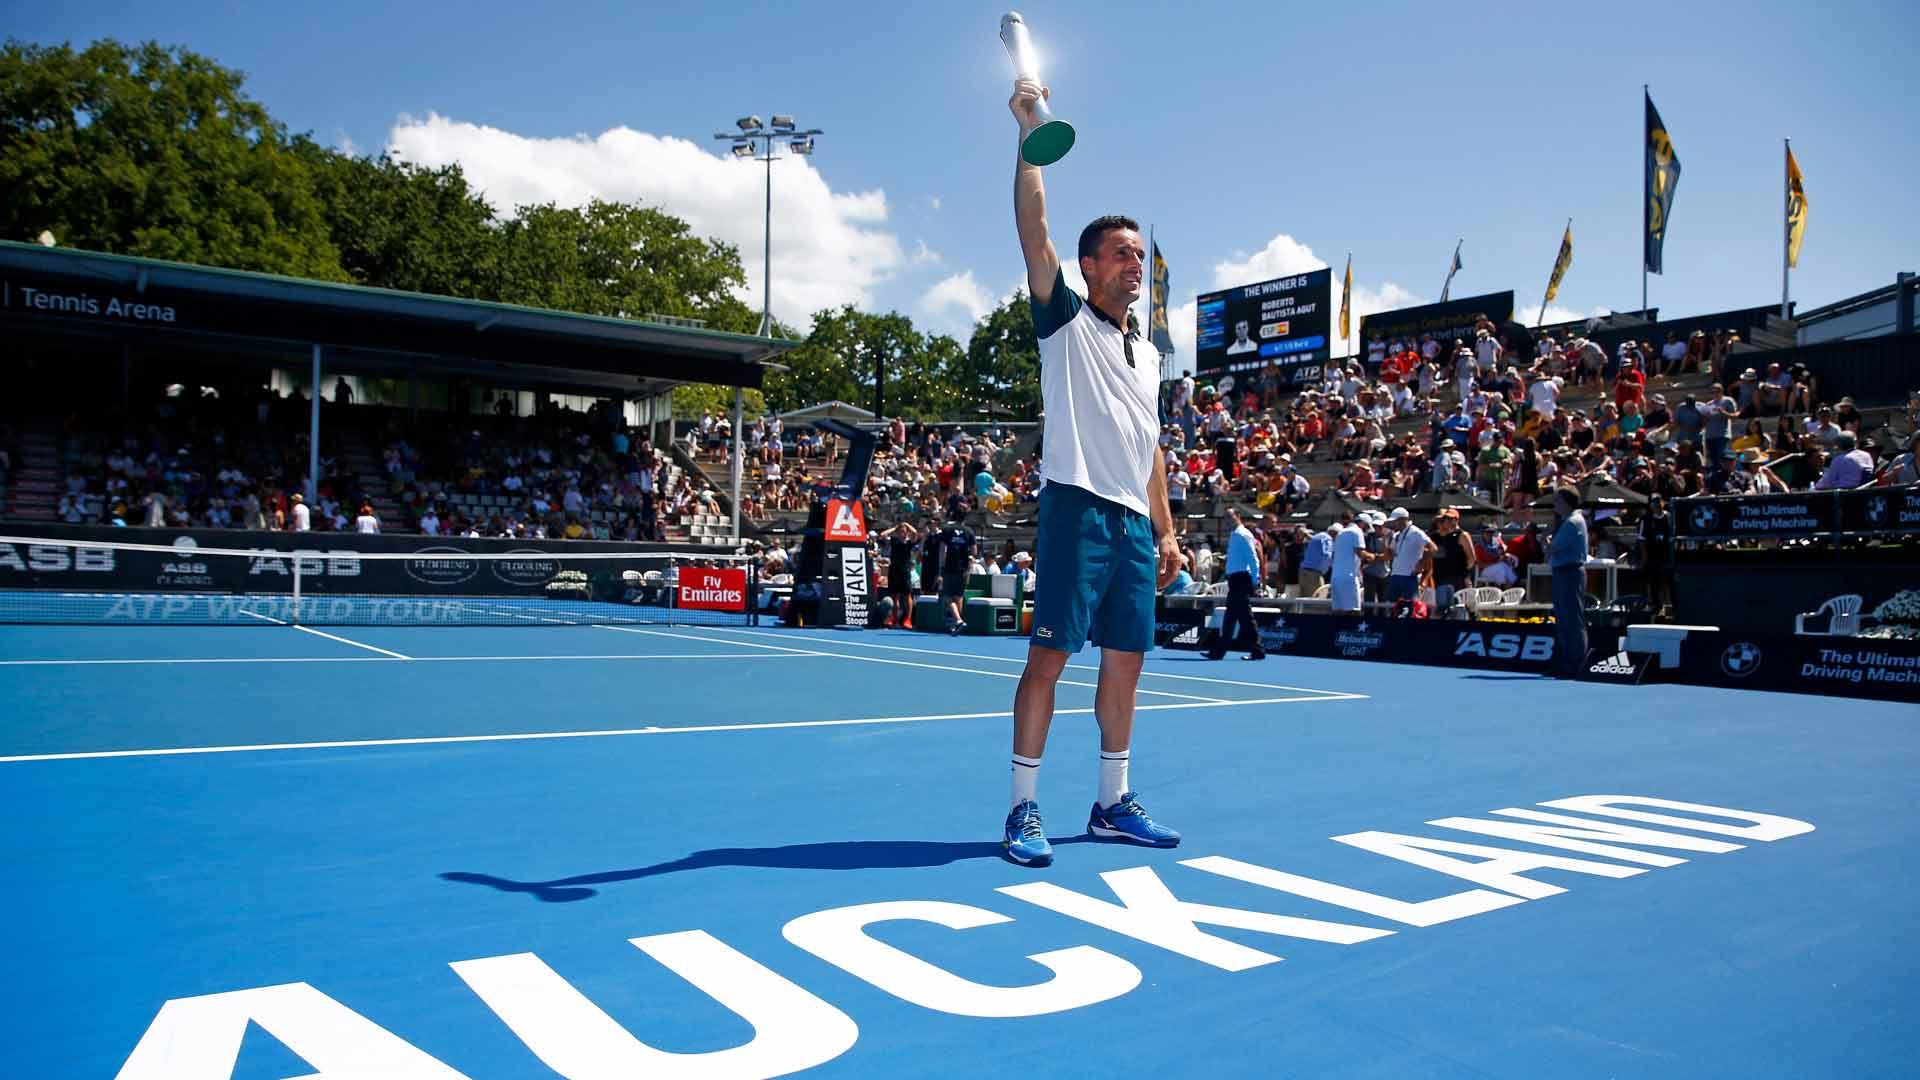 bautista agut auckland 2016 final - V Aucklandu že odpovedali teniški turnir z letnico 2022